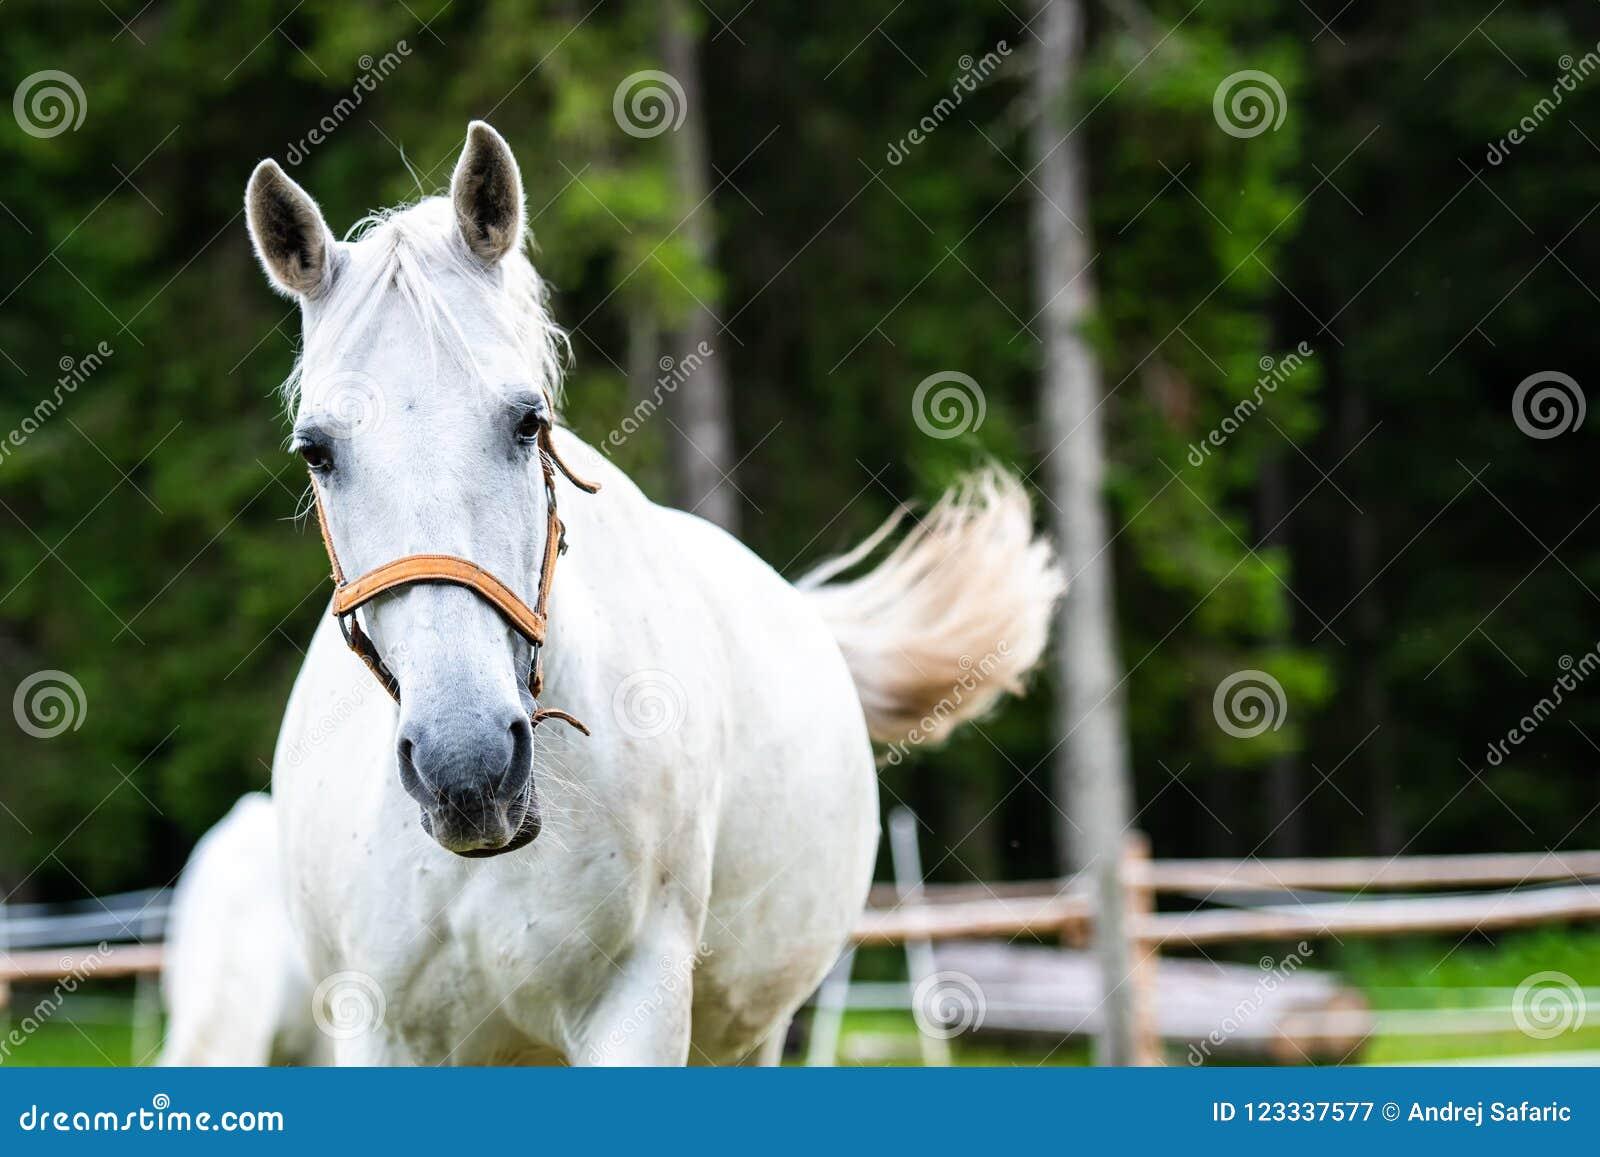 White Lipizzan Horse running in Stable